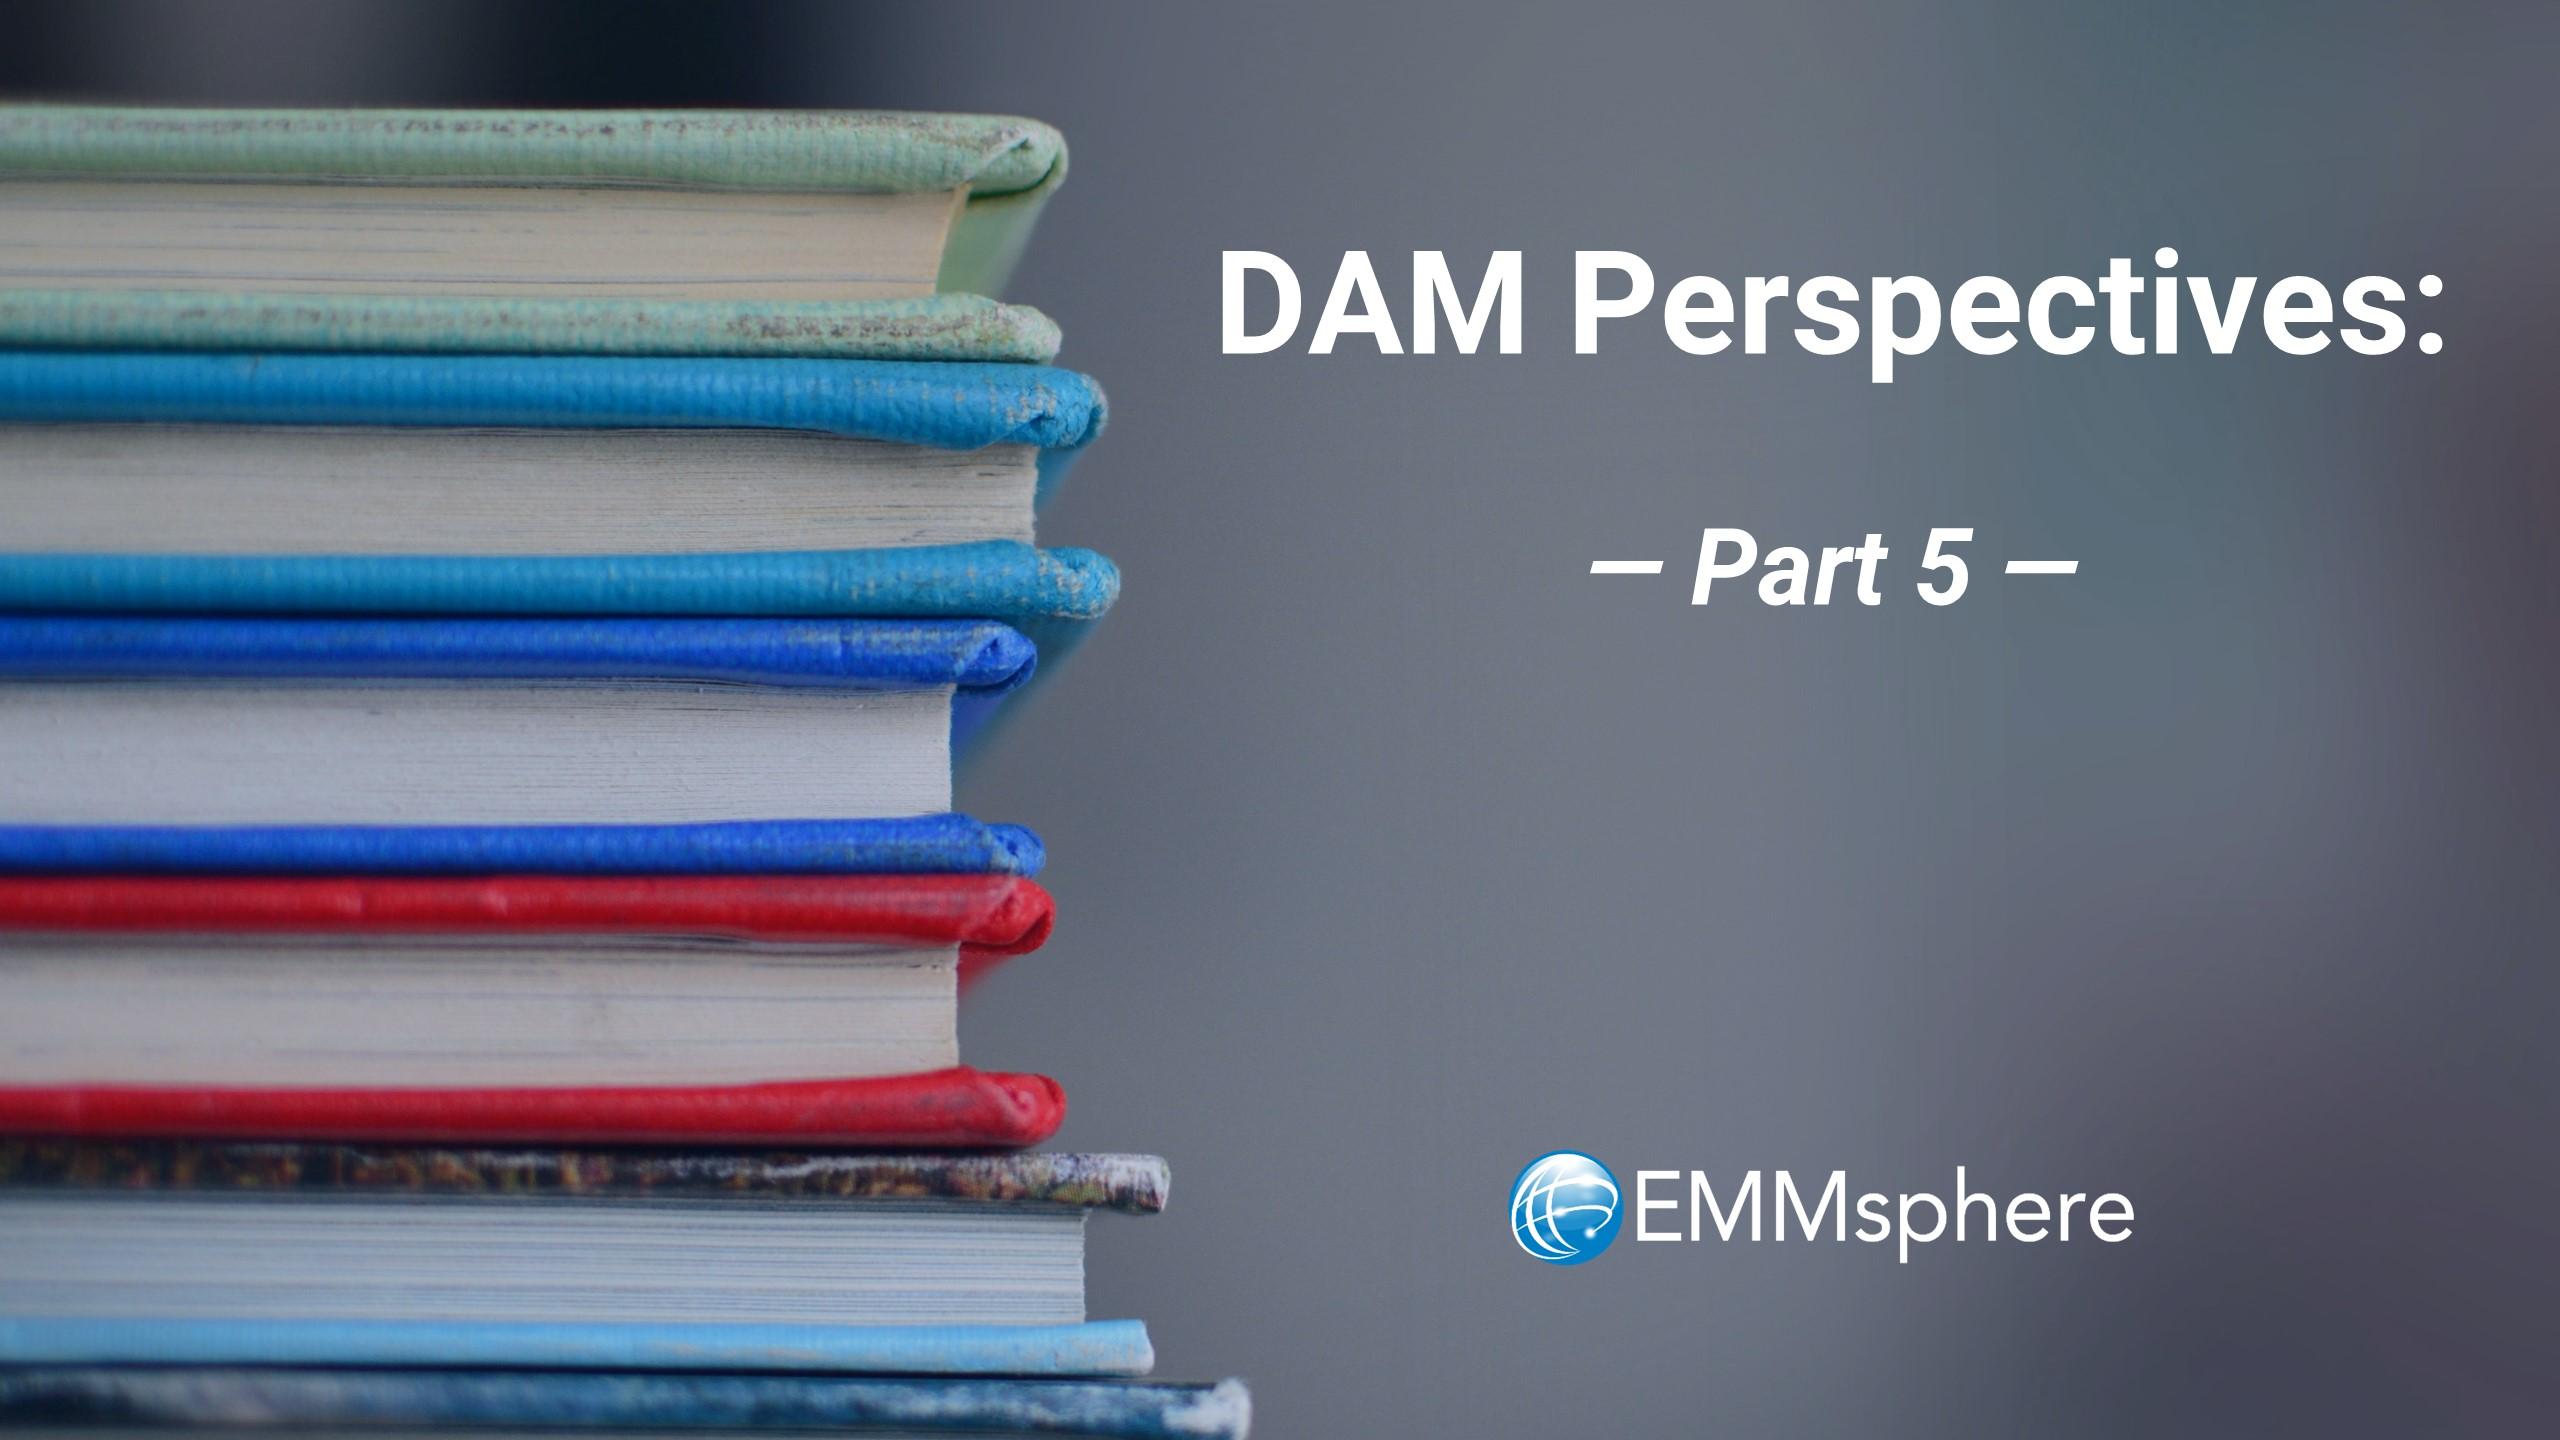 DAM Perspectives - Part 5